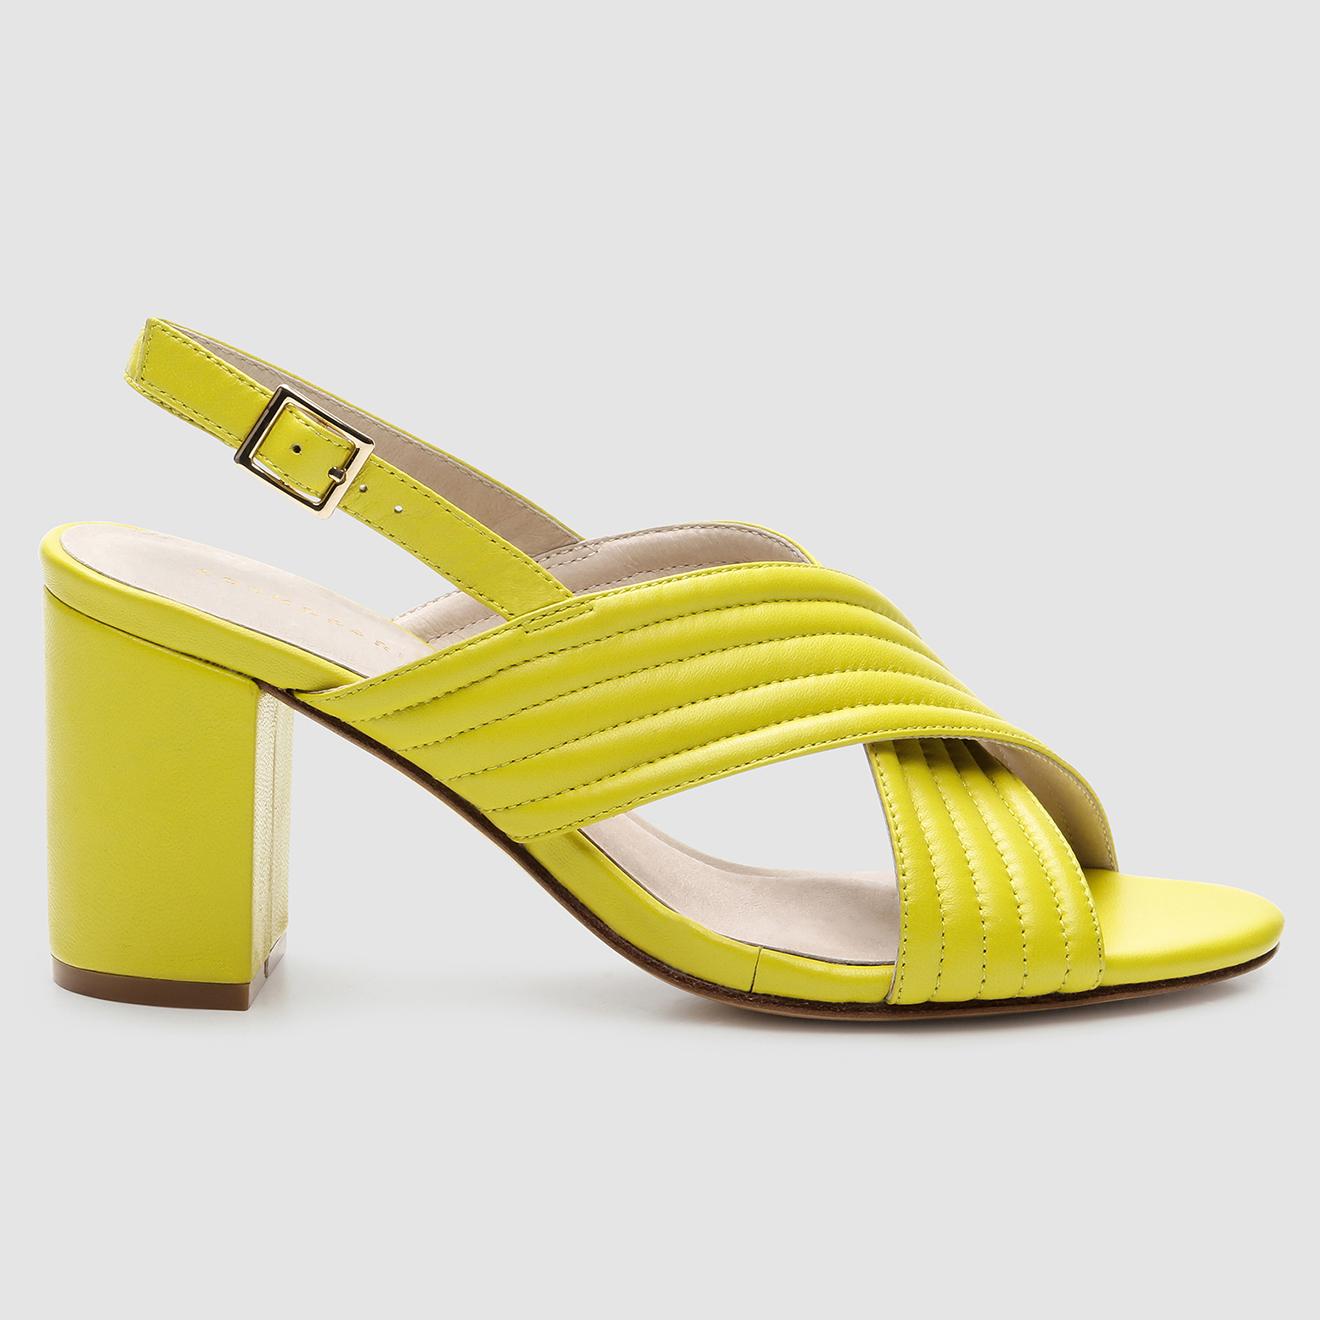 Sandales en Cuir Hilin - Talon 7 cm - Cosmoparis - Modalova